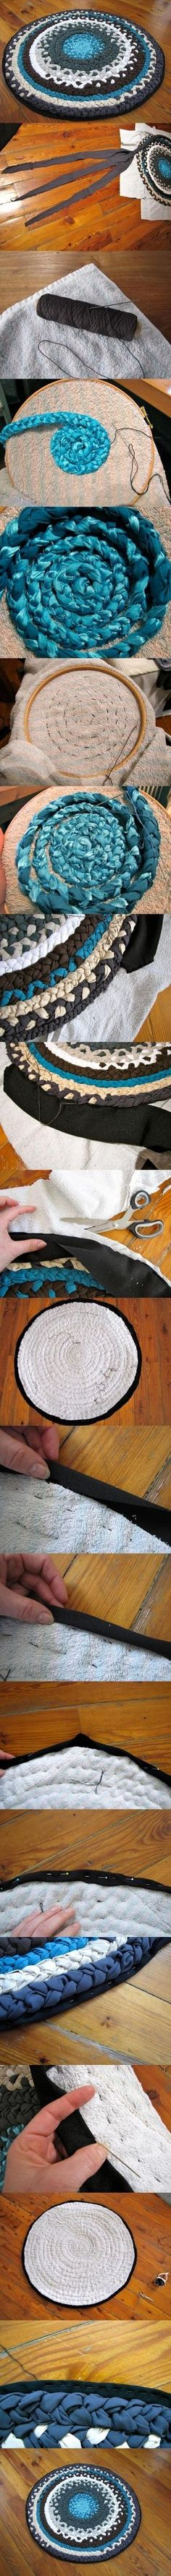 DIY Braided Fabric Rug DIY Braided Fabric Rug by diyforever